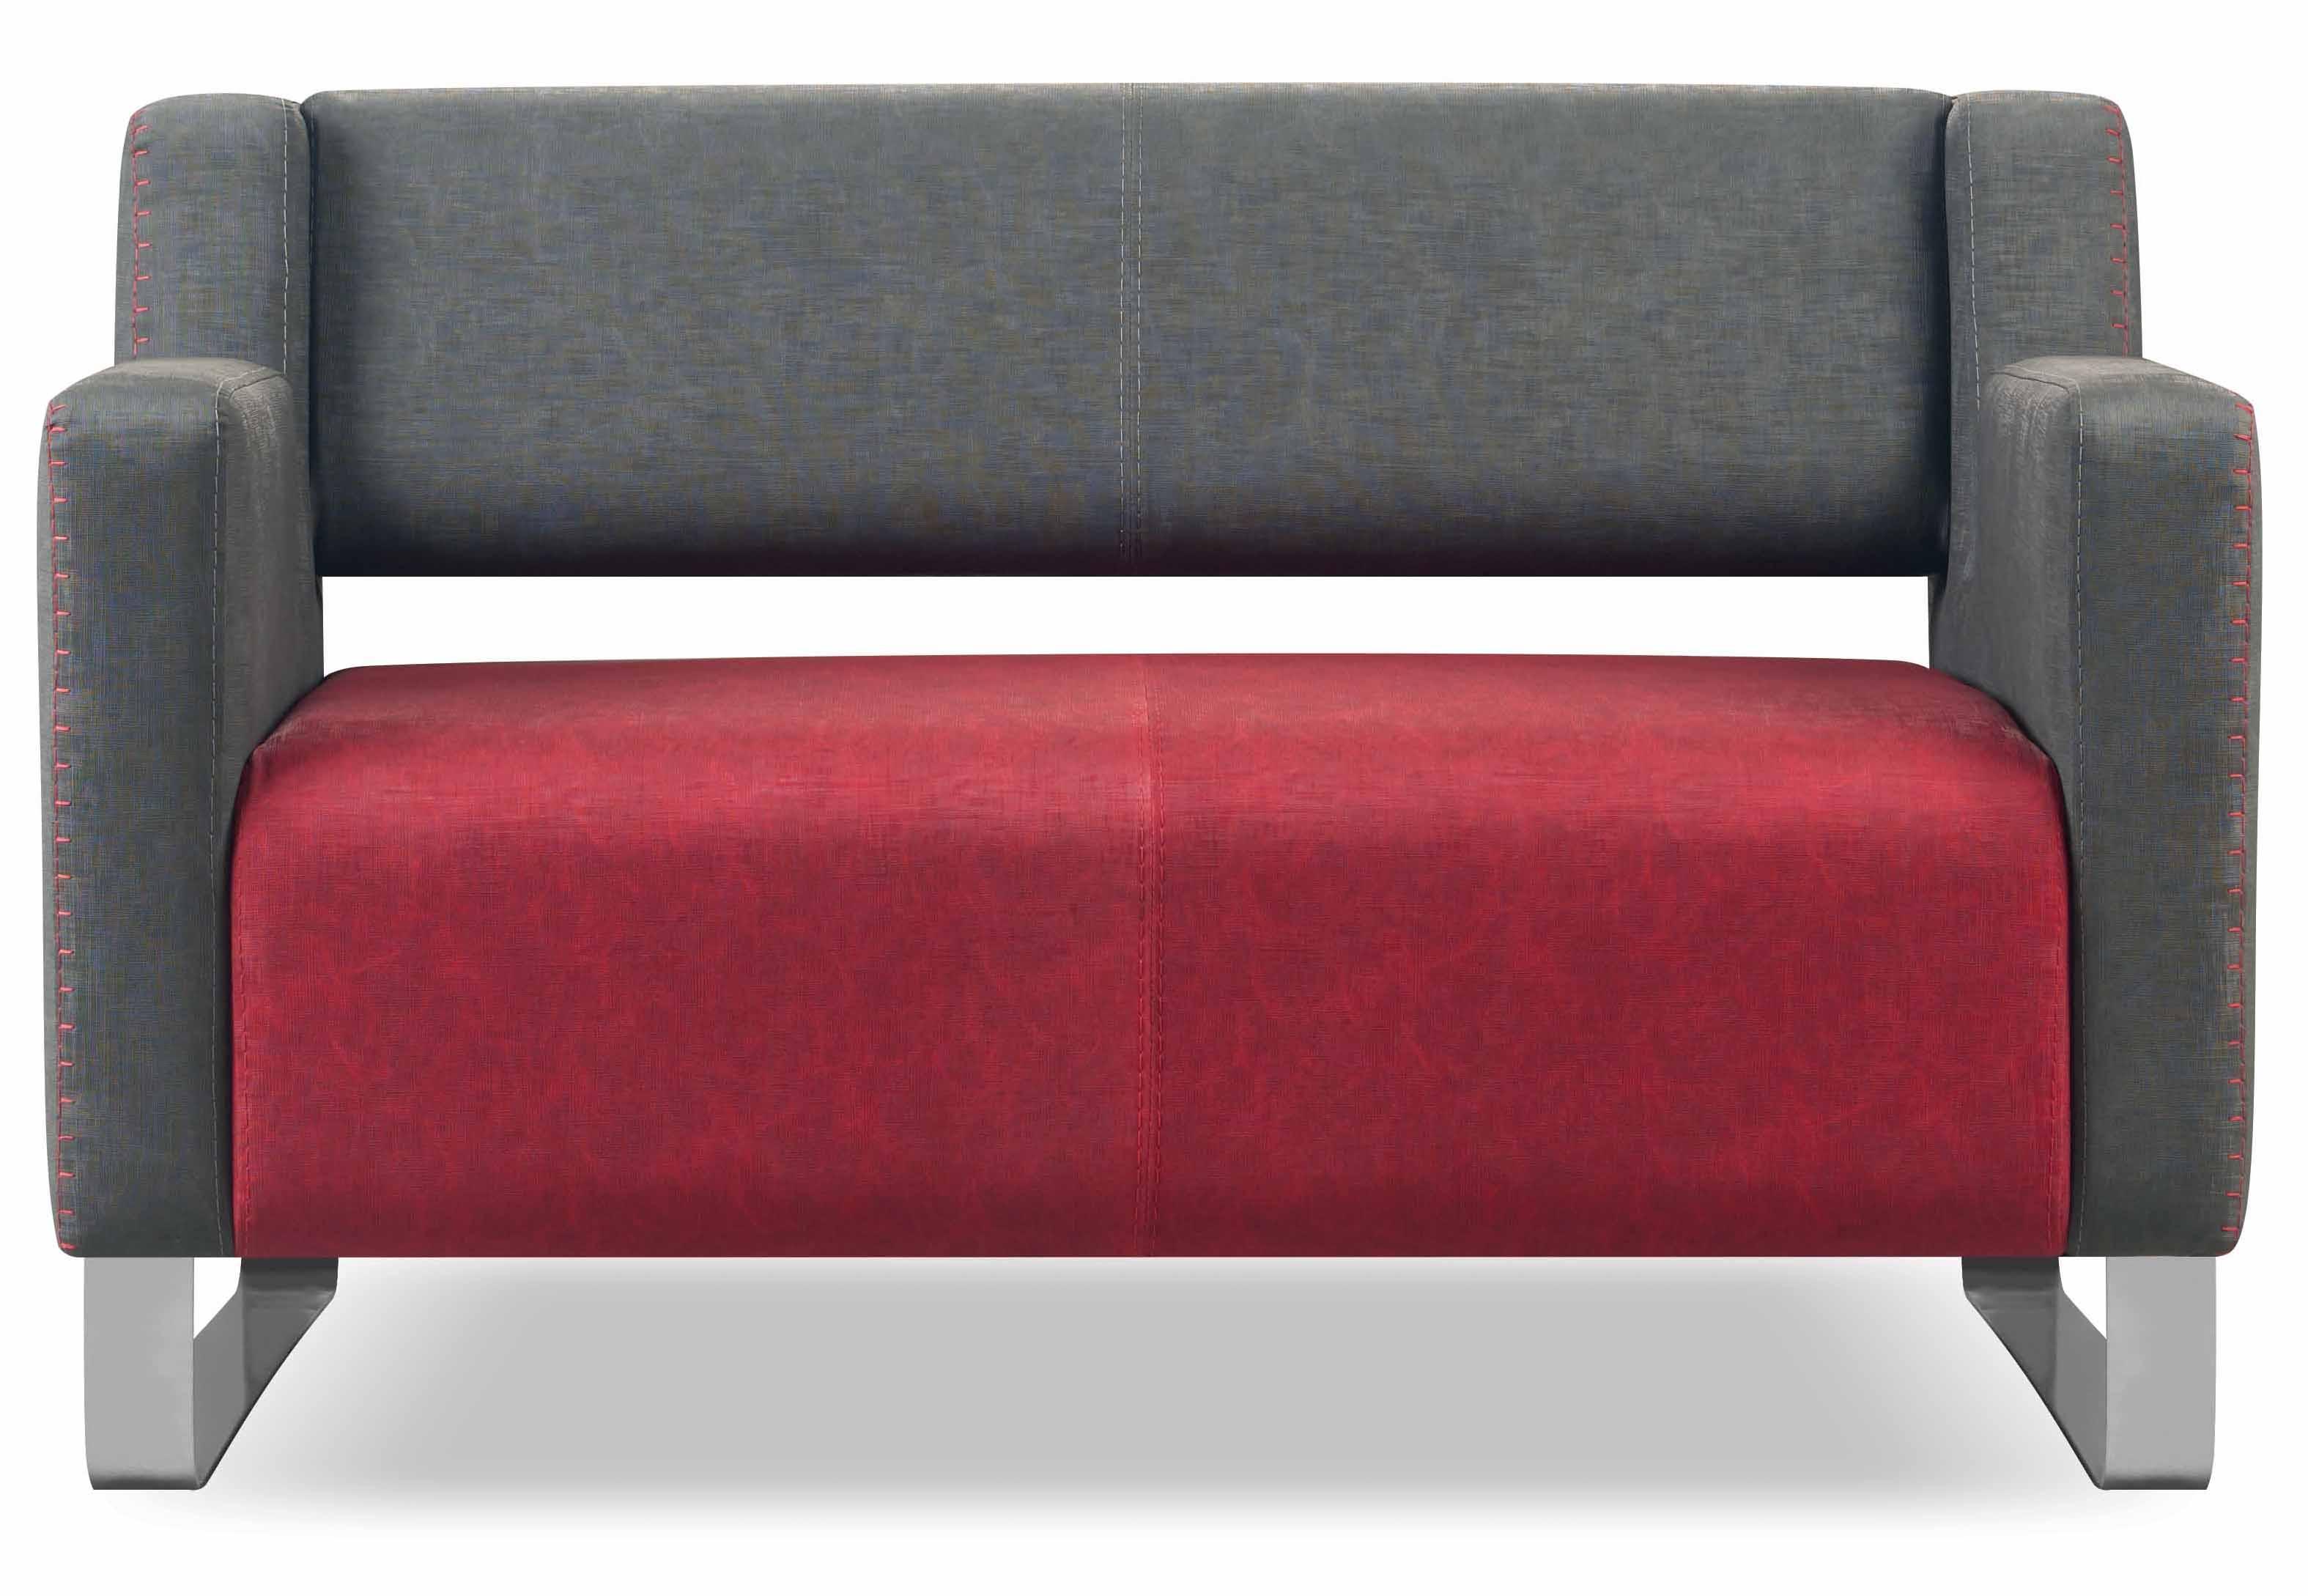 mango sofa 2 sitzer grau bordeaux m bel star. Black Bedroom Furniture Sets. Home Design Ideas